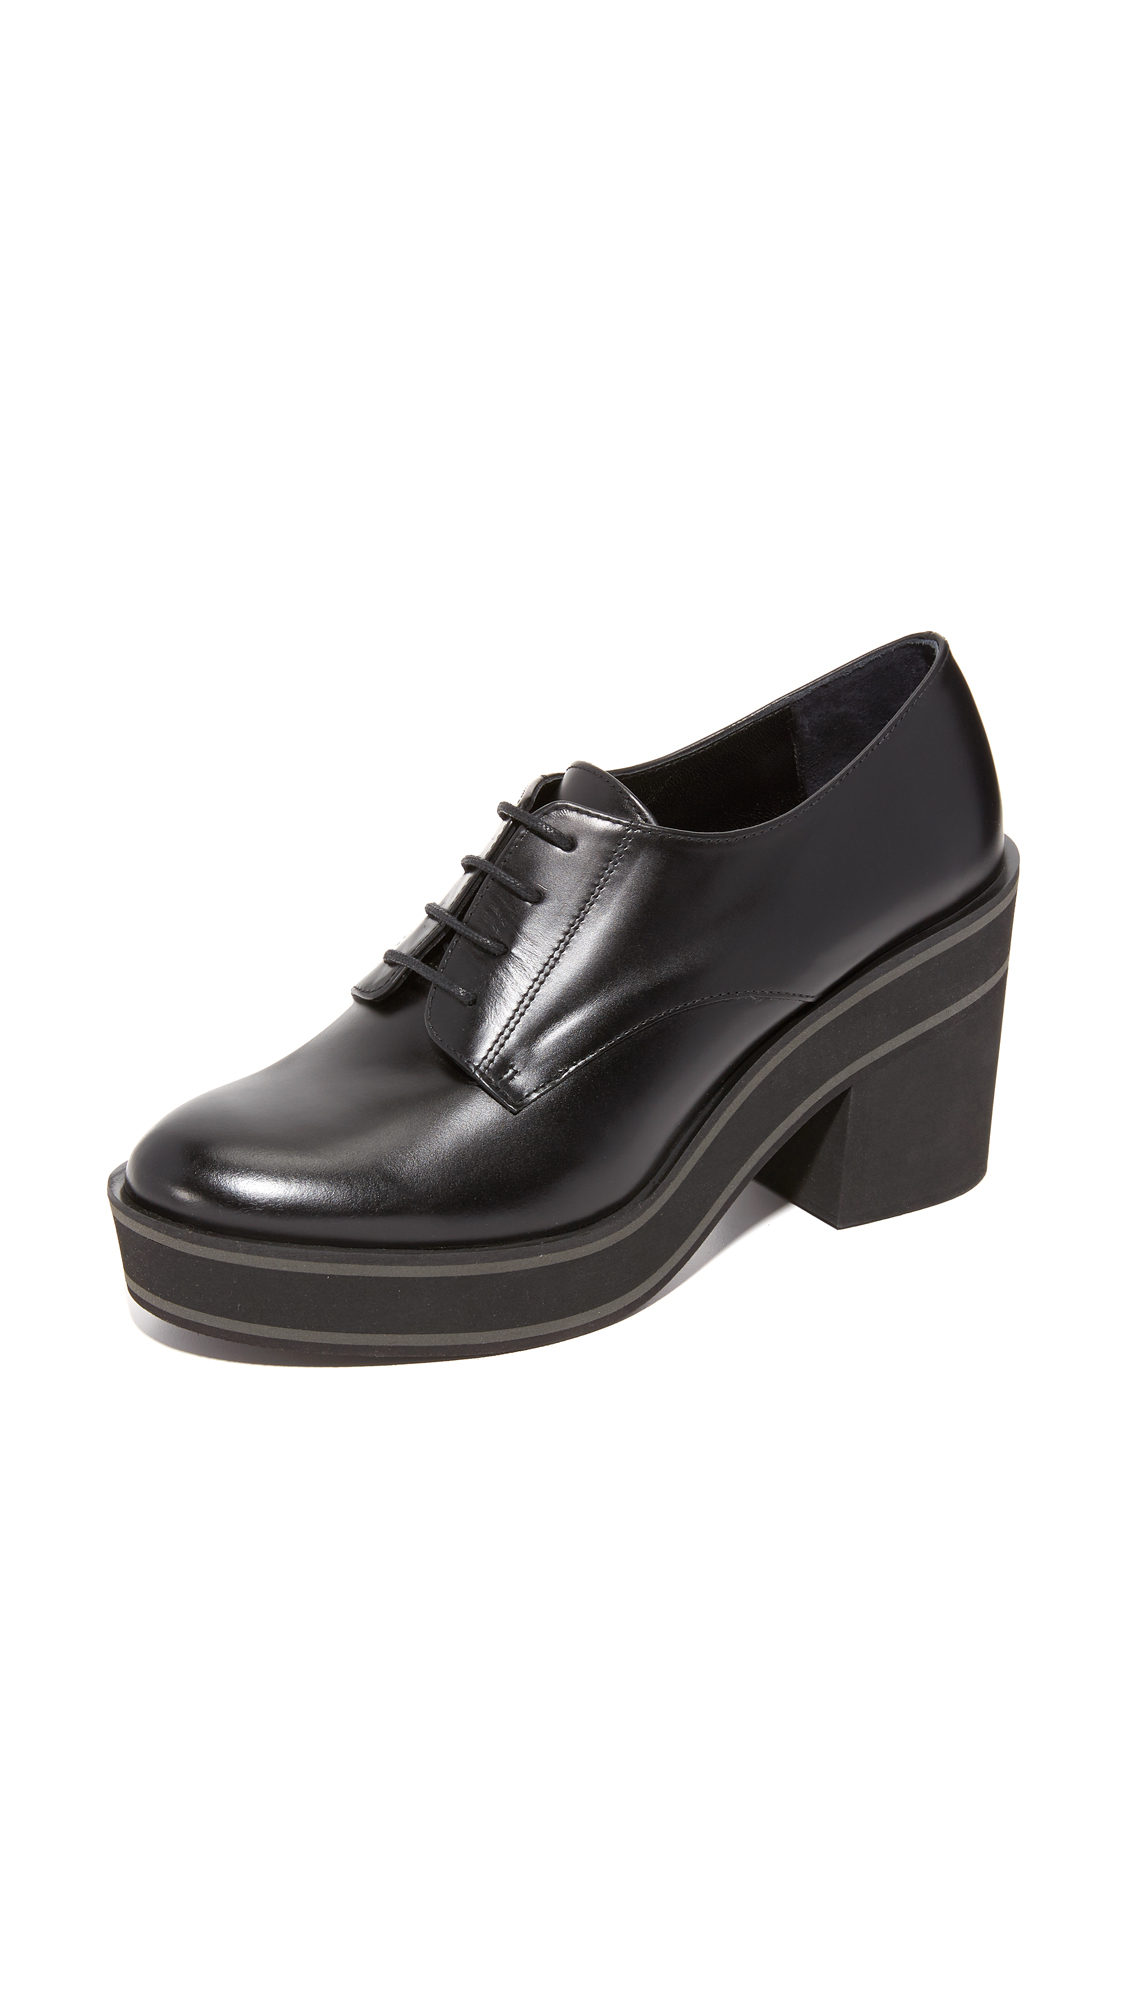 Paloma Barcelo Black Flatform Shoes